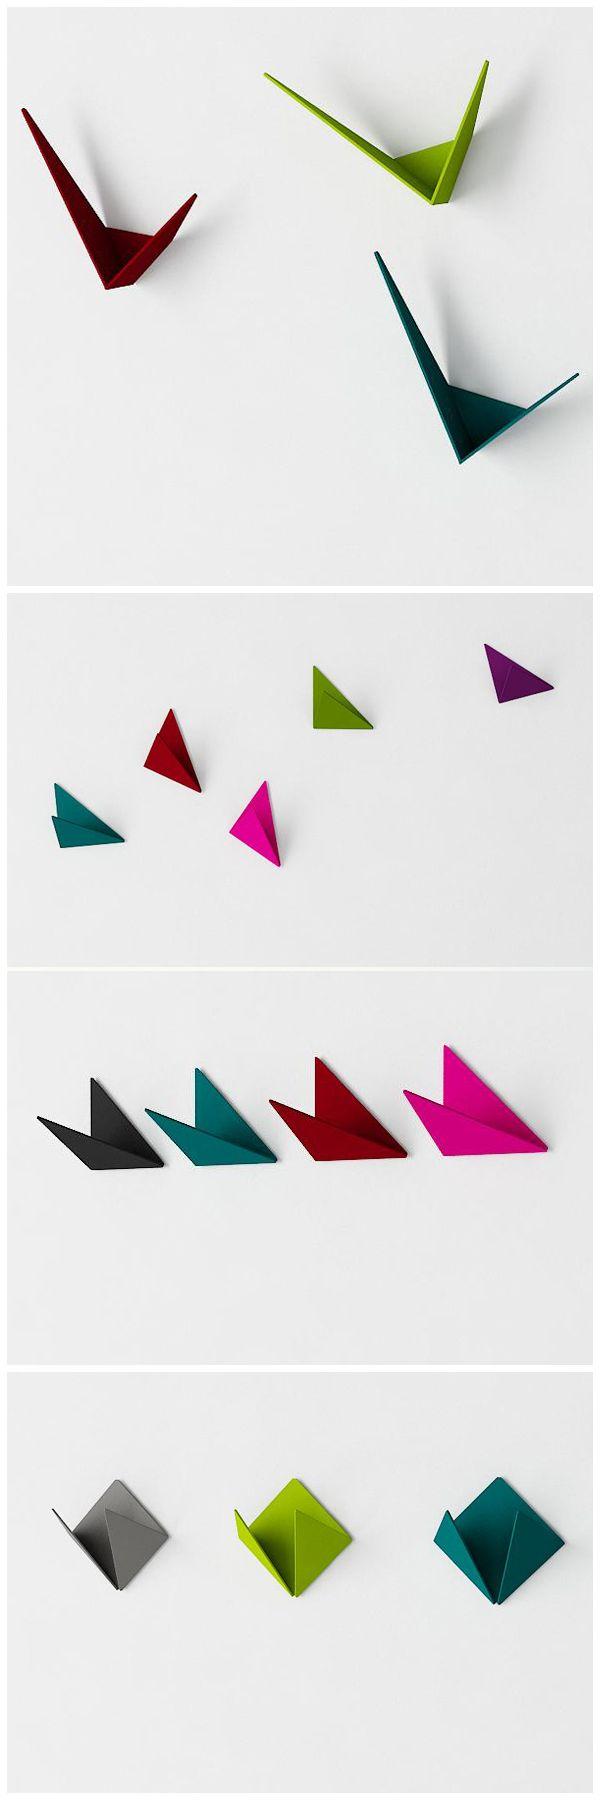 zginamy i doginamy blachę #metal #coat #hangers #kosicka #design #moderndesign #origami #kosickadesign